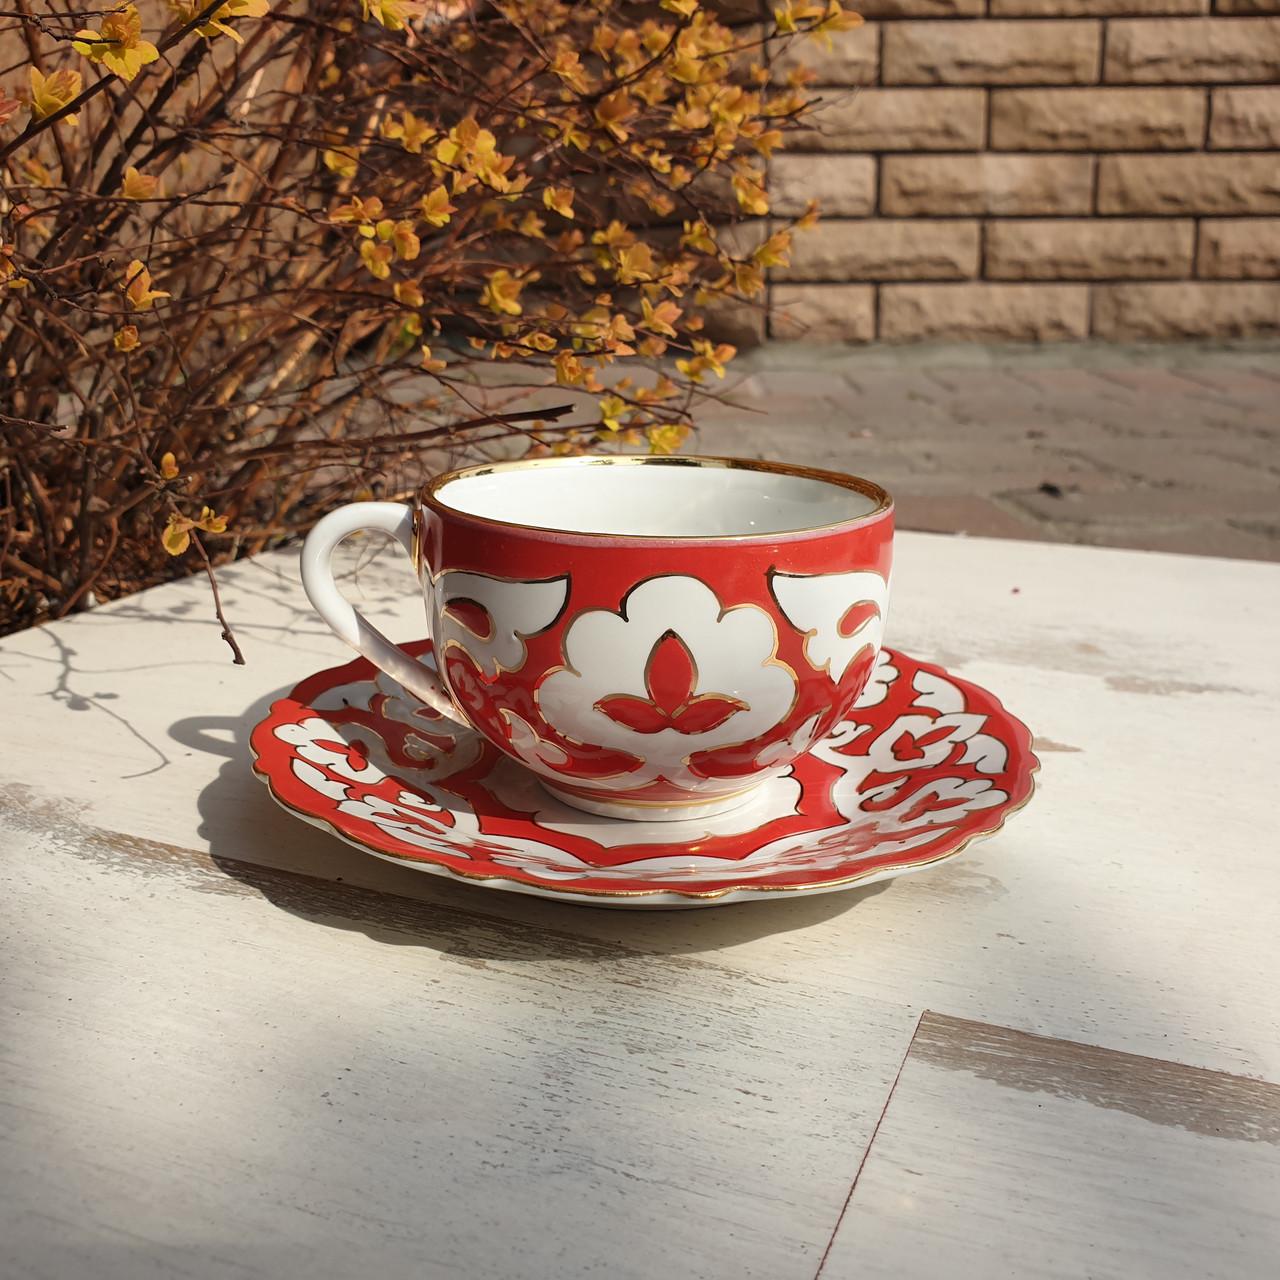 "Чашка и десертная тарелка ""ПАХТА"" красная с золотым декором. Ташкент, Узбекистан (3)"